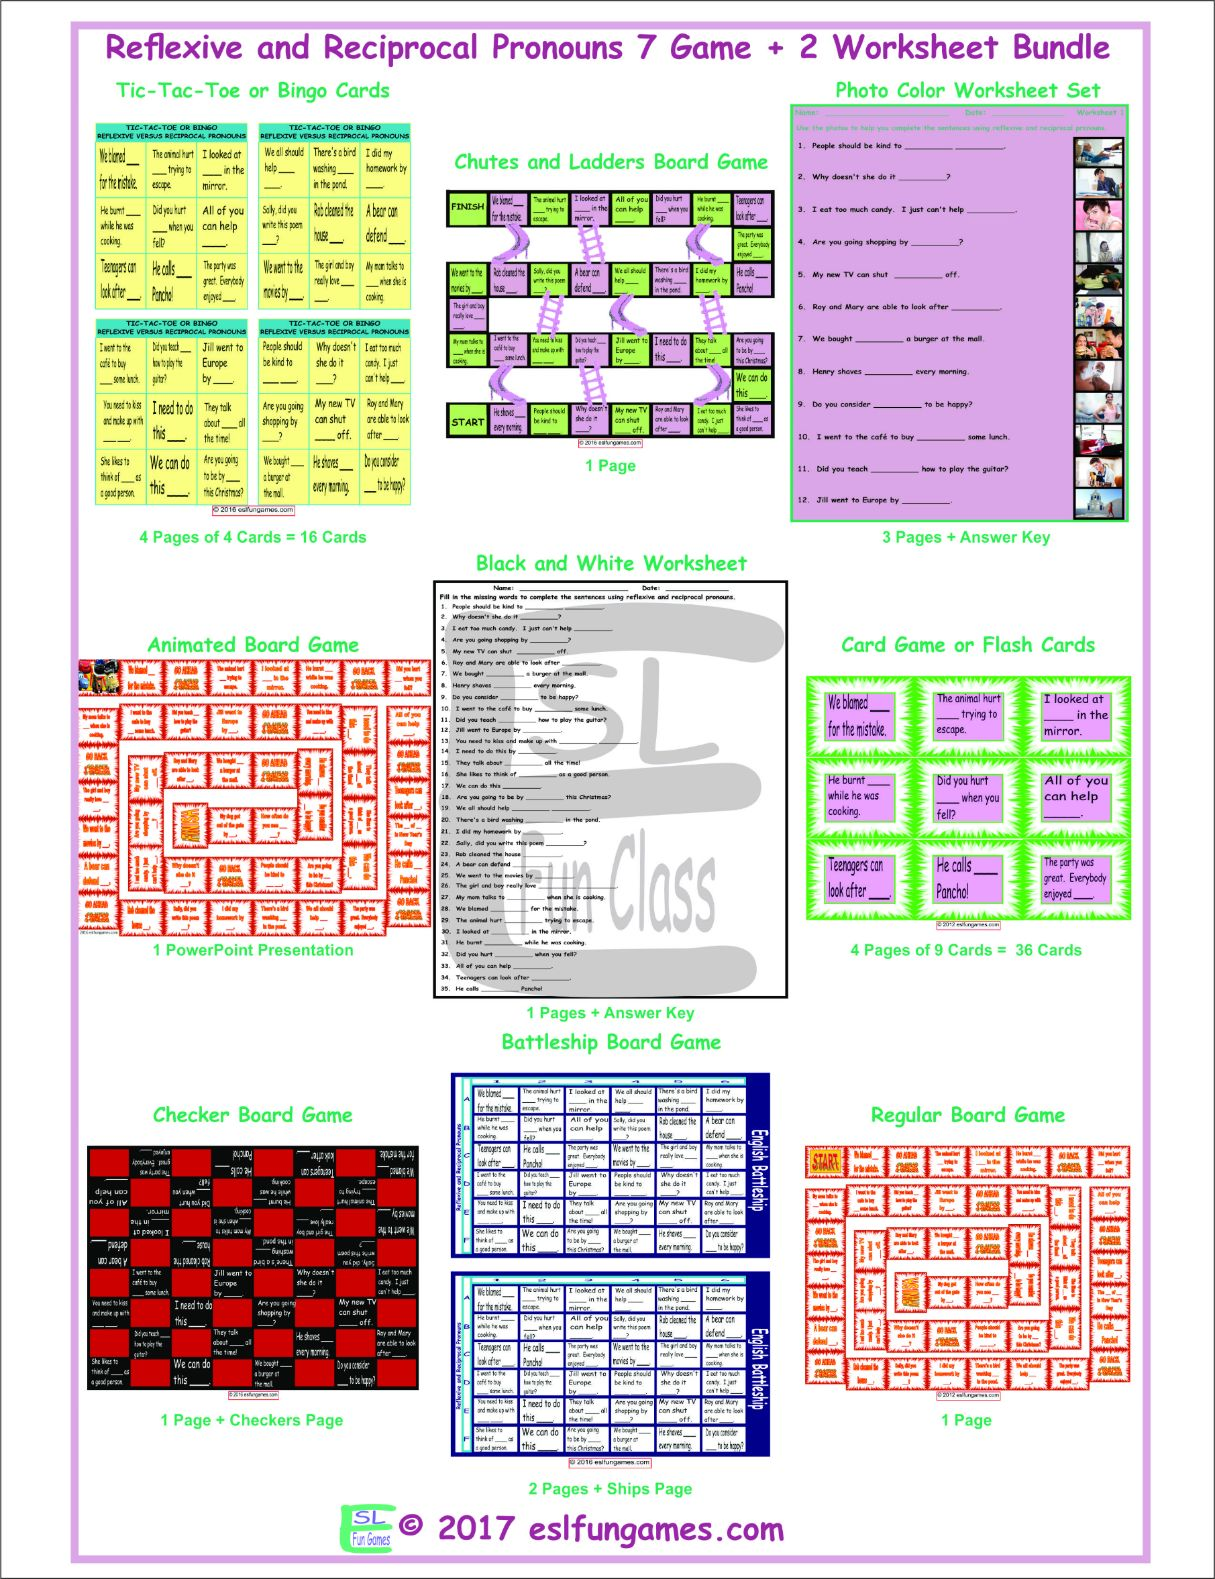 Reflexive and Reciprocal Pronouns 7 Game Plus 2 Worksheet Bundle